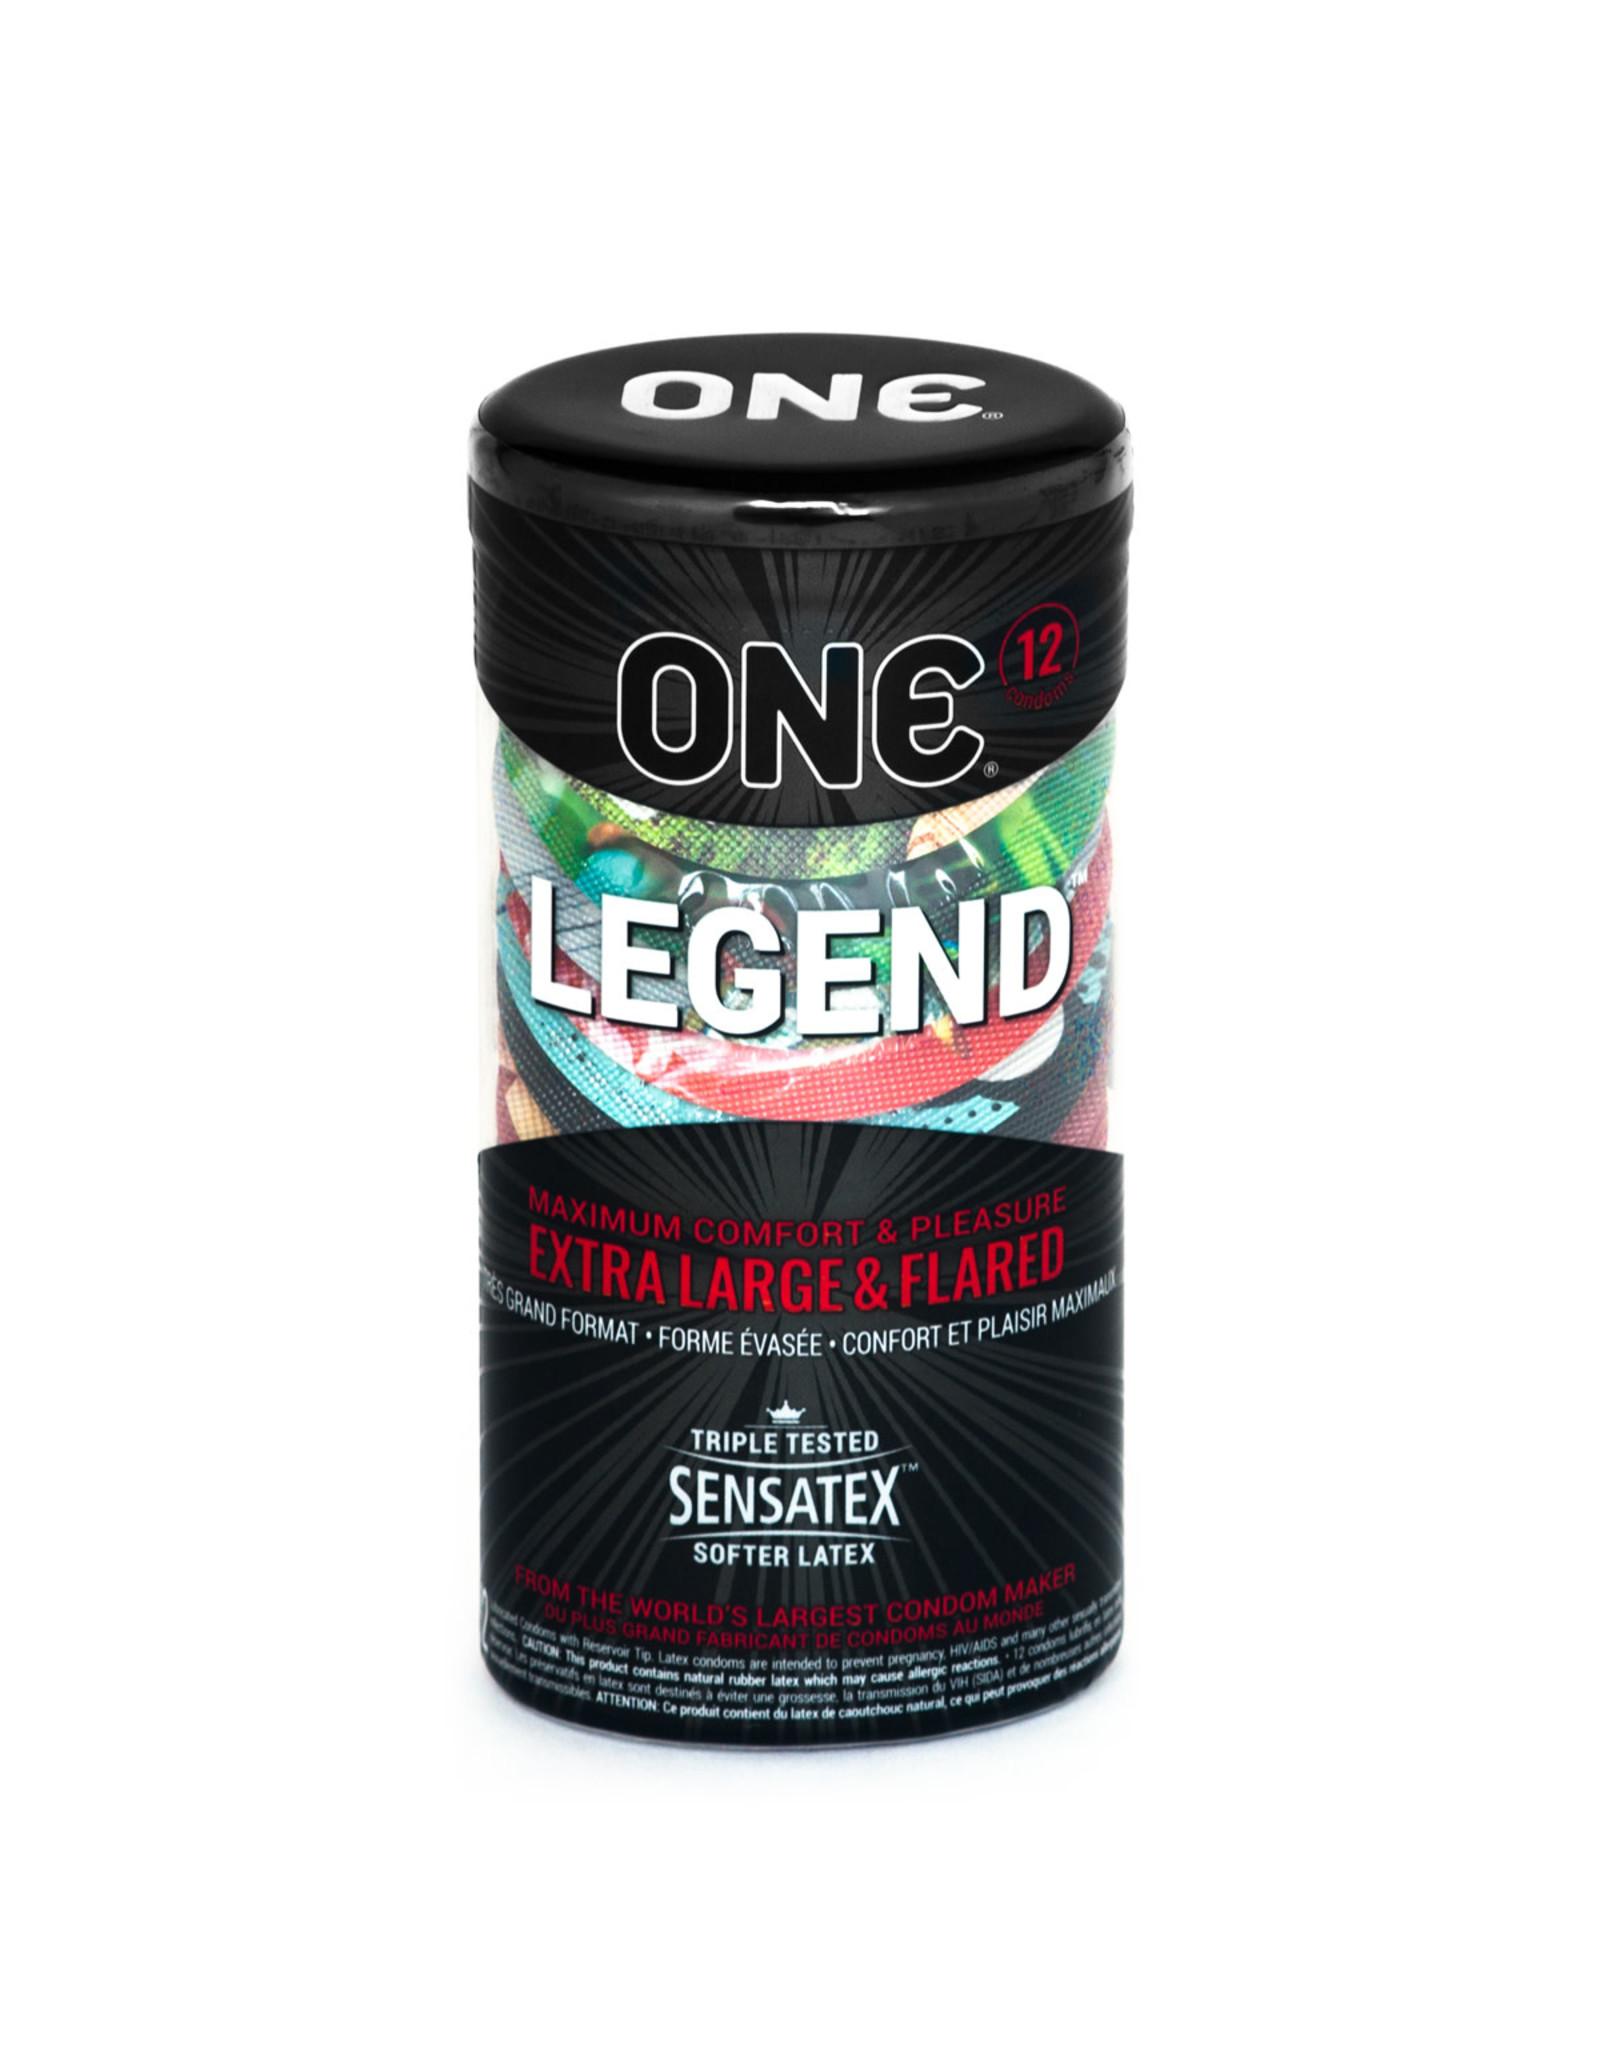 One One The Legend Condoms 12pk